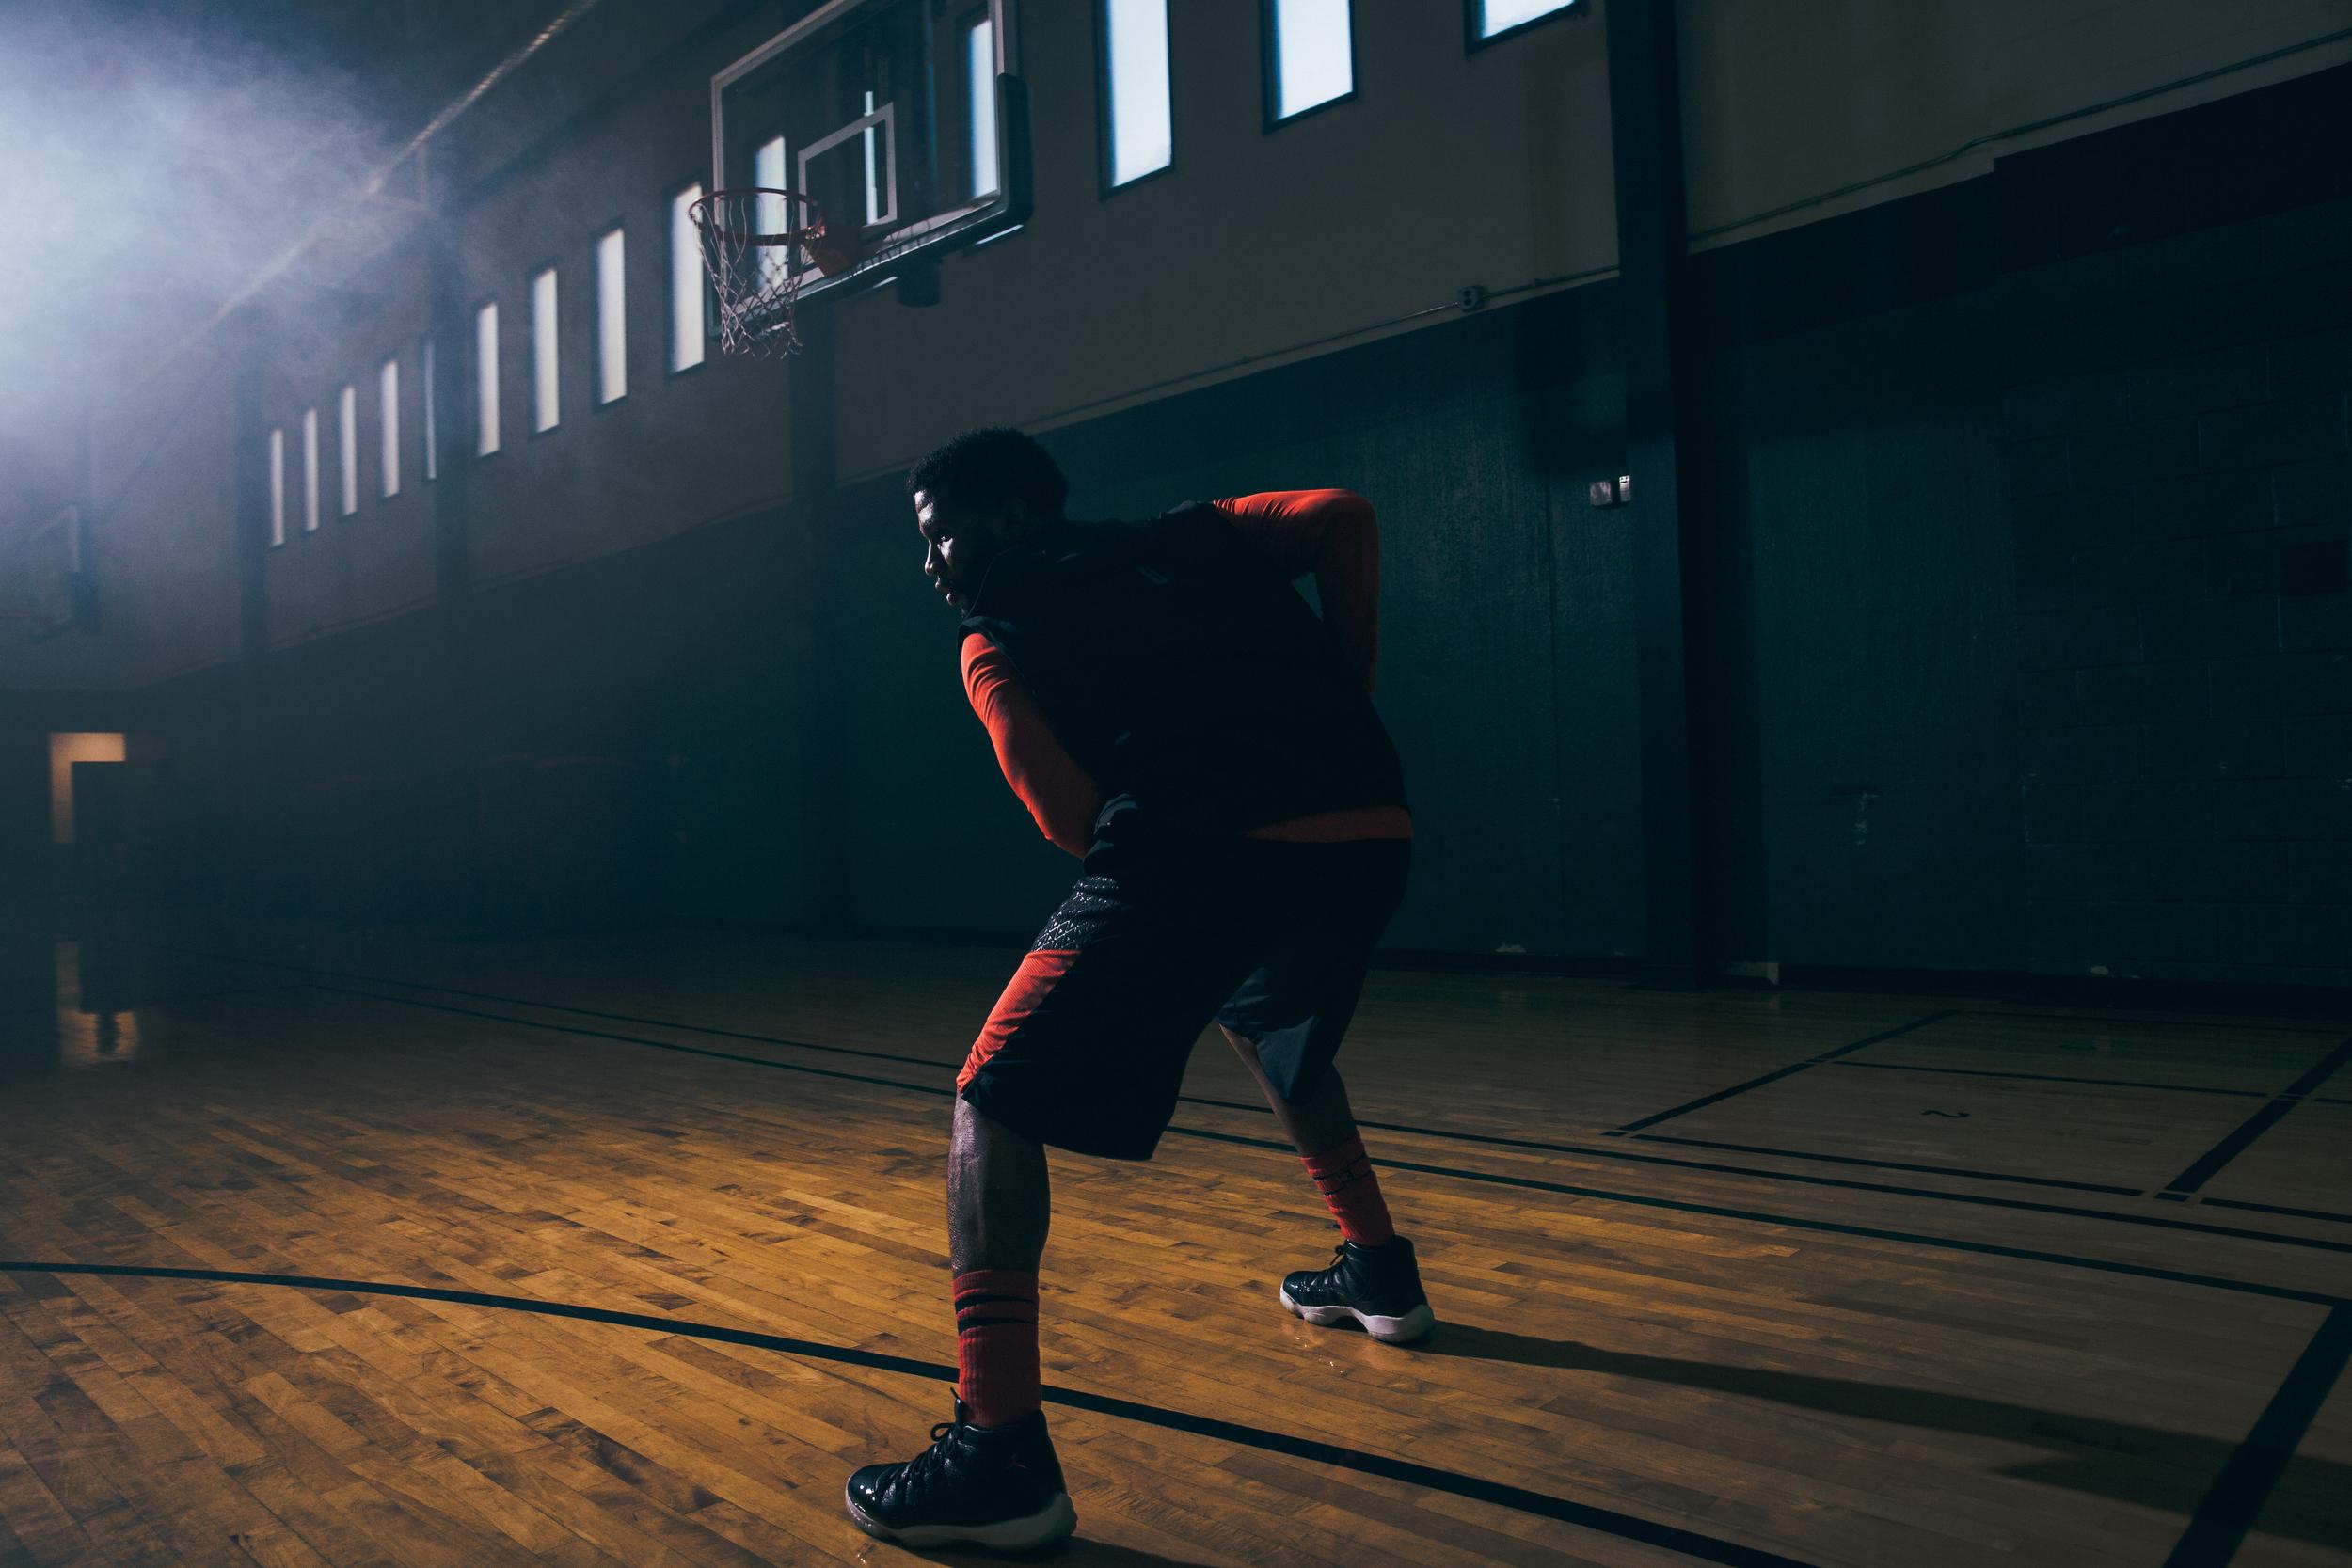 Nov 7, 2016; Atlanta, GA, USA; Point3 Basketball brand shoot on location in Atlanta, GA.